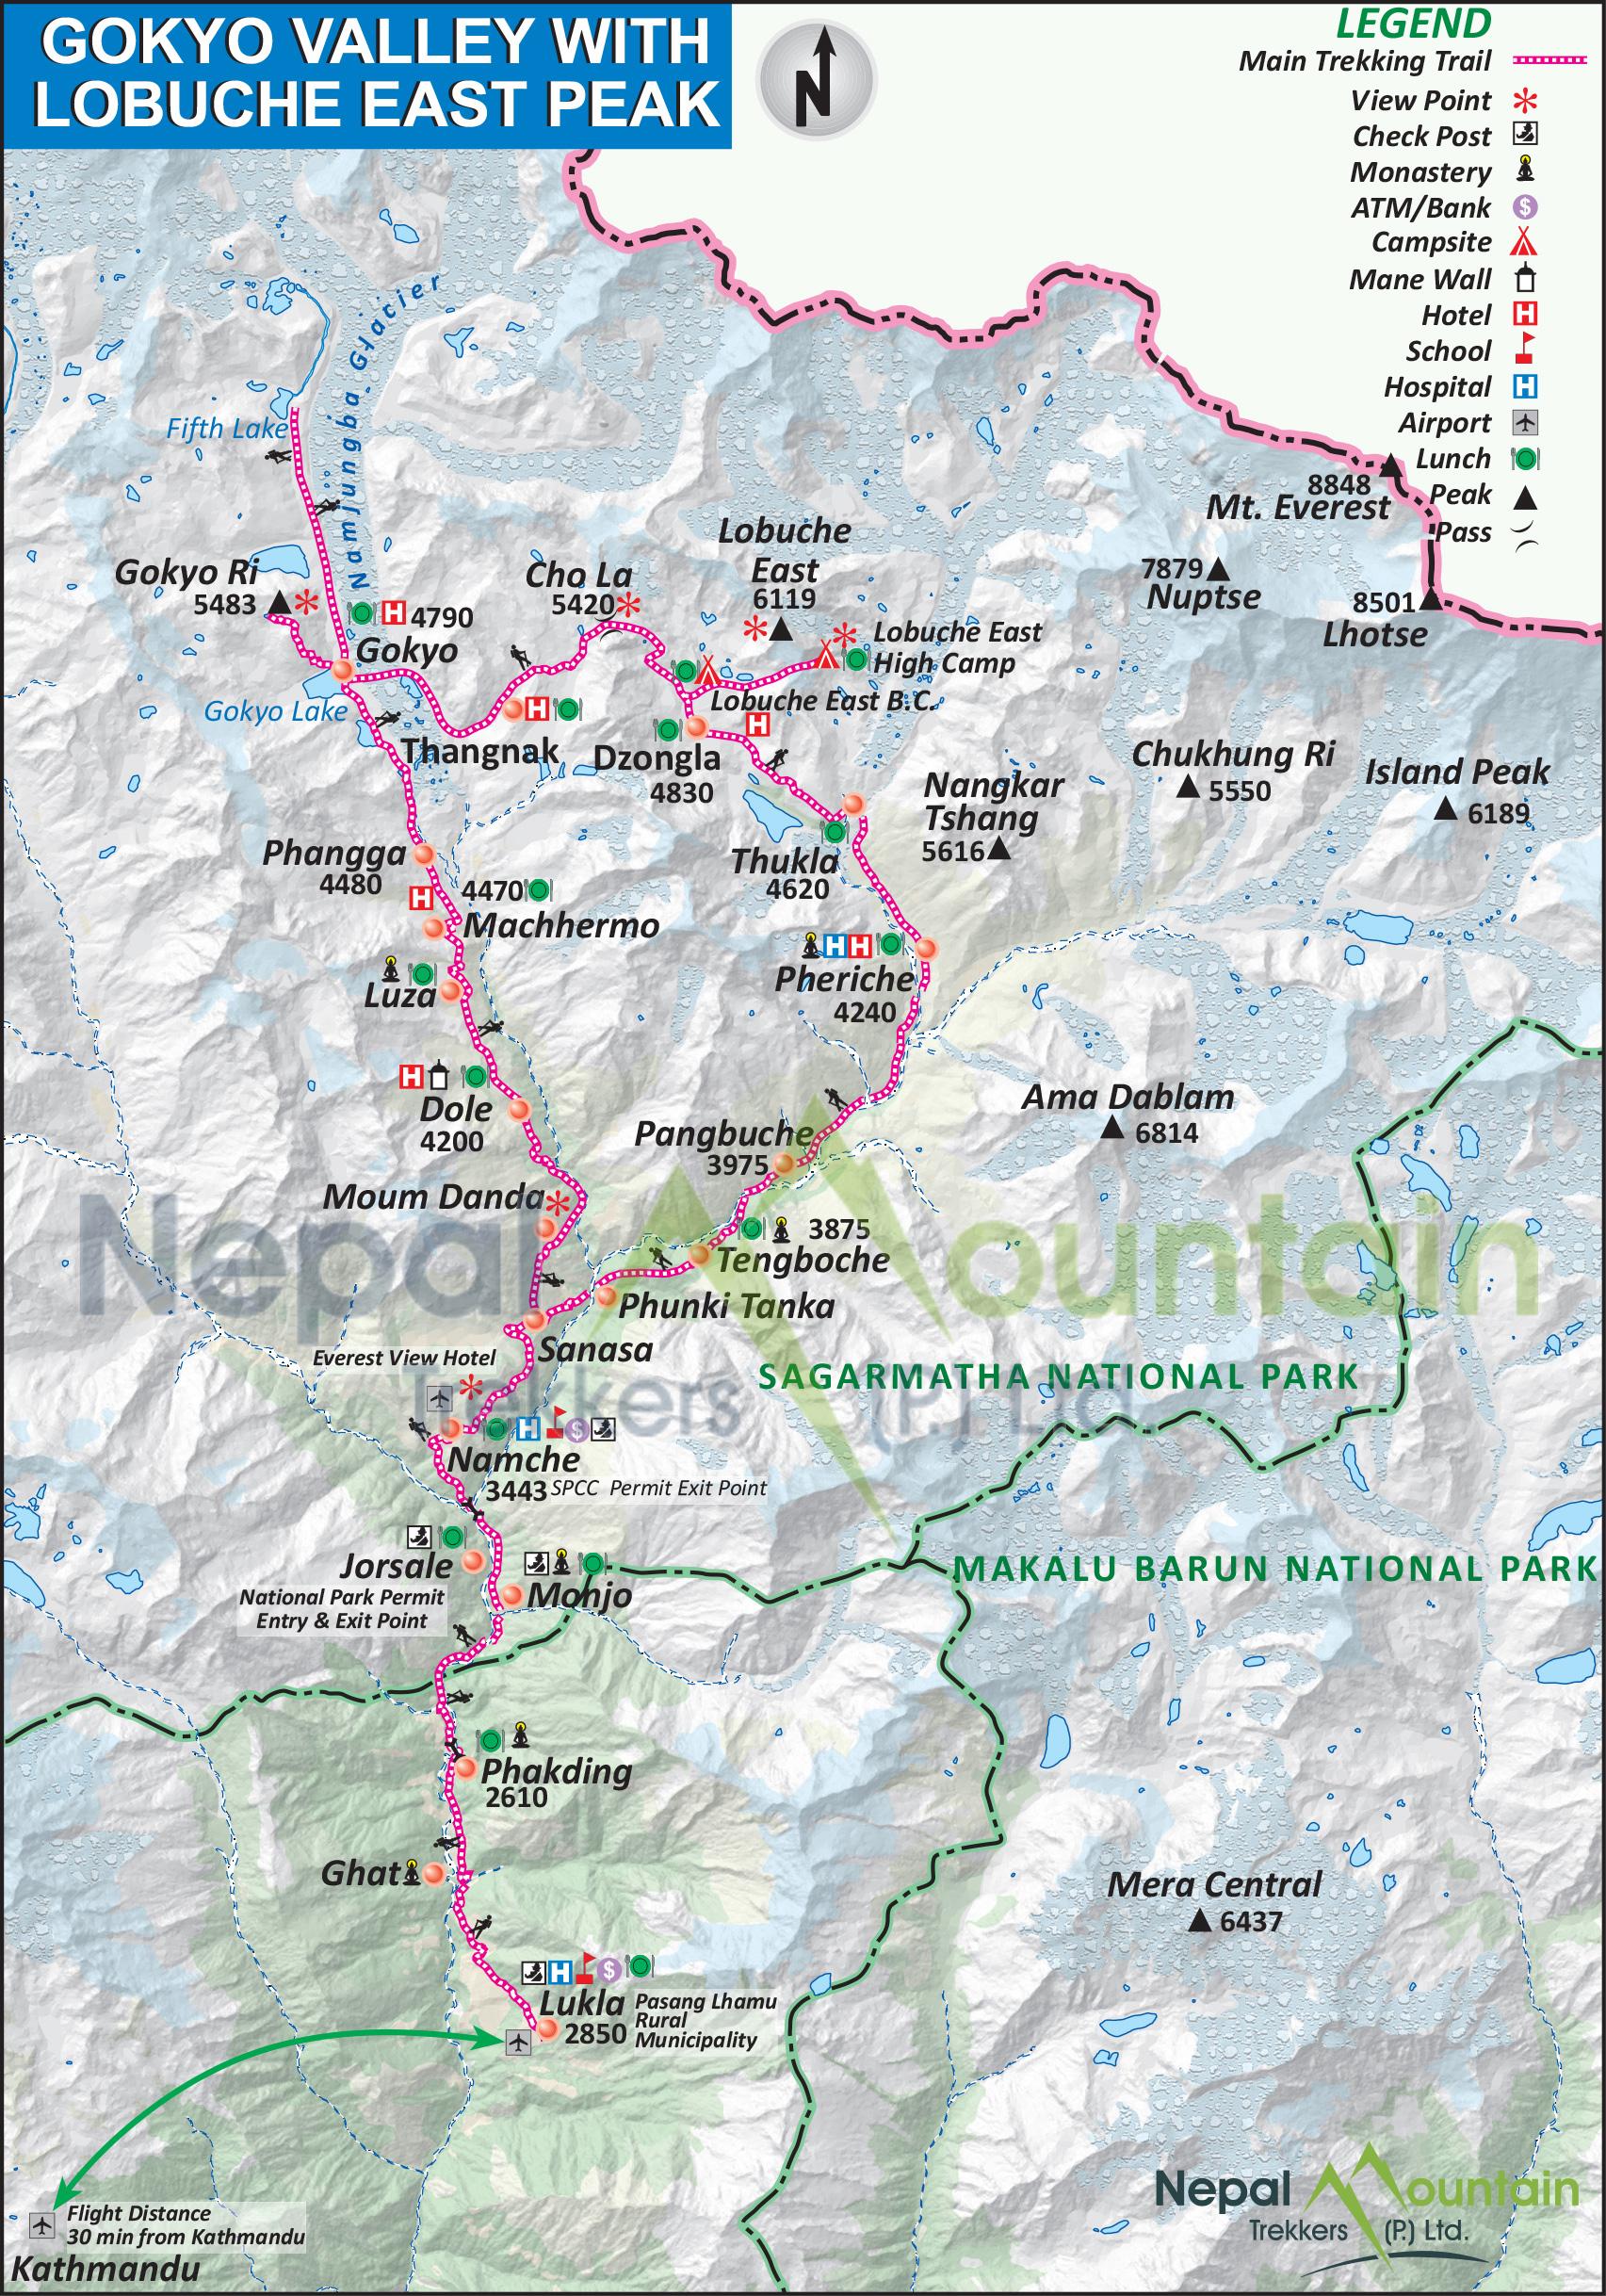 map of Gokyo Valley with Lobuche East Peak Climbing